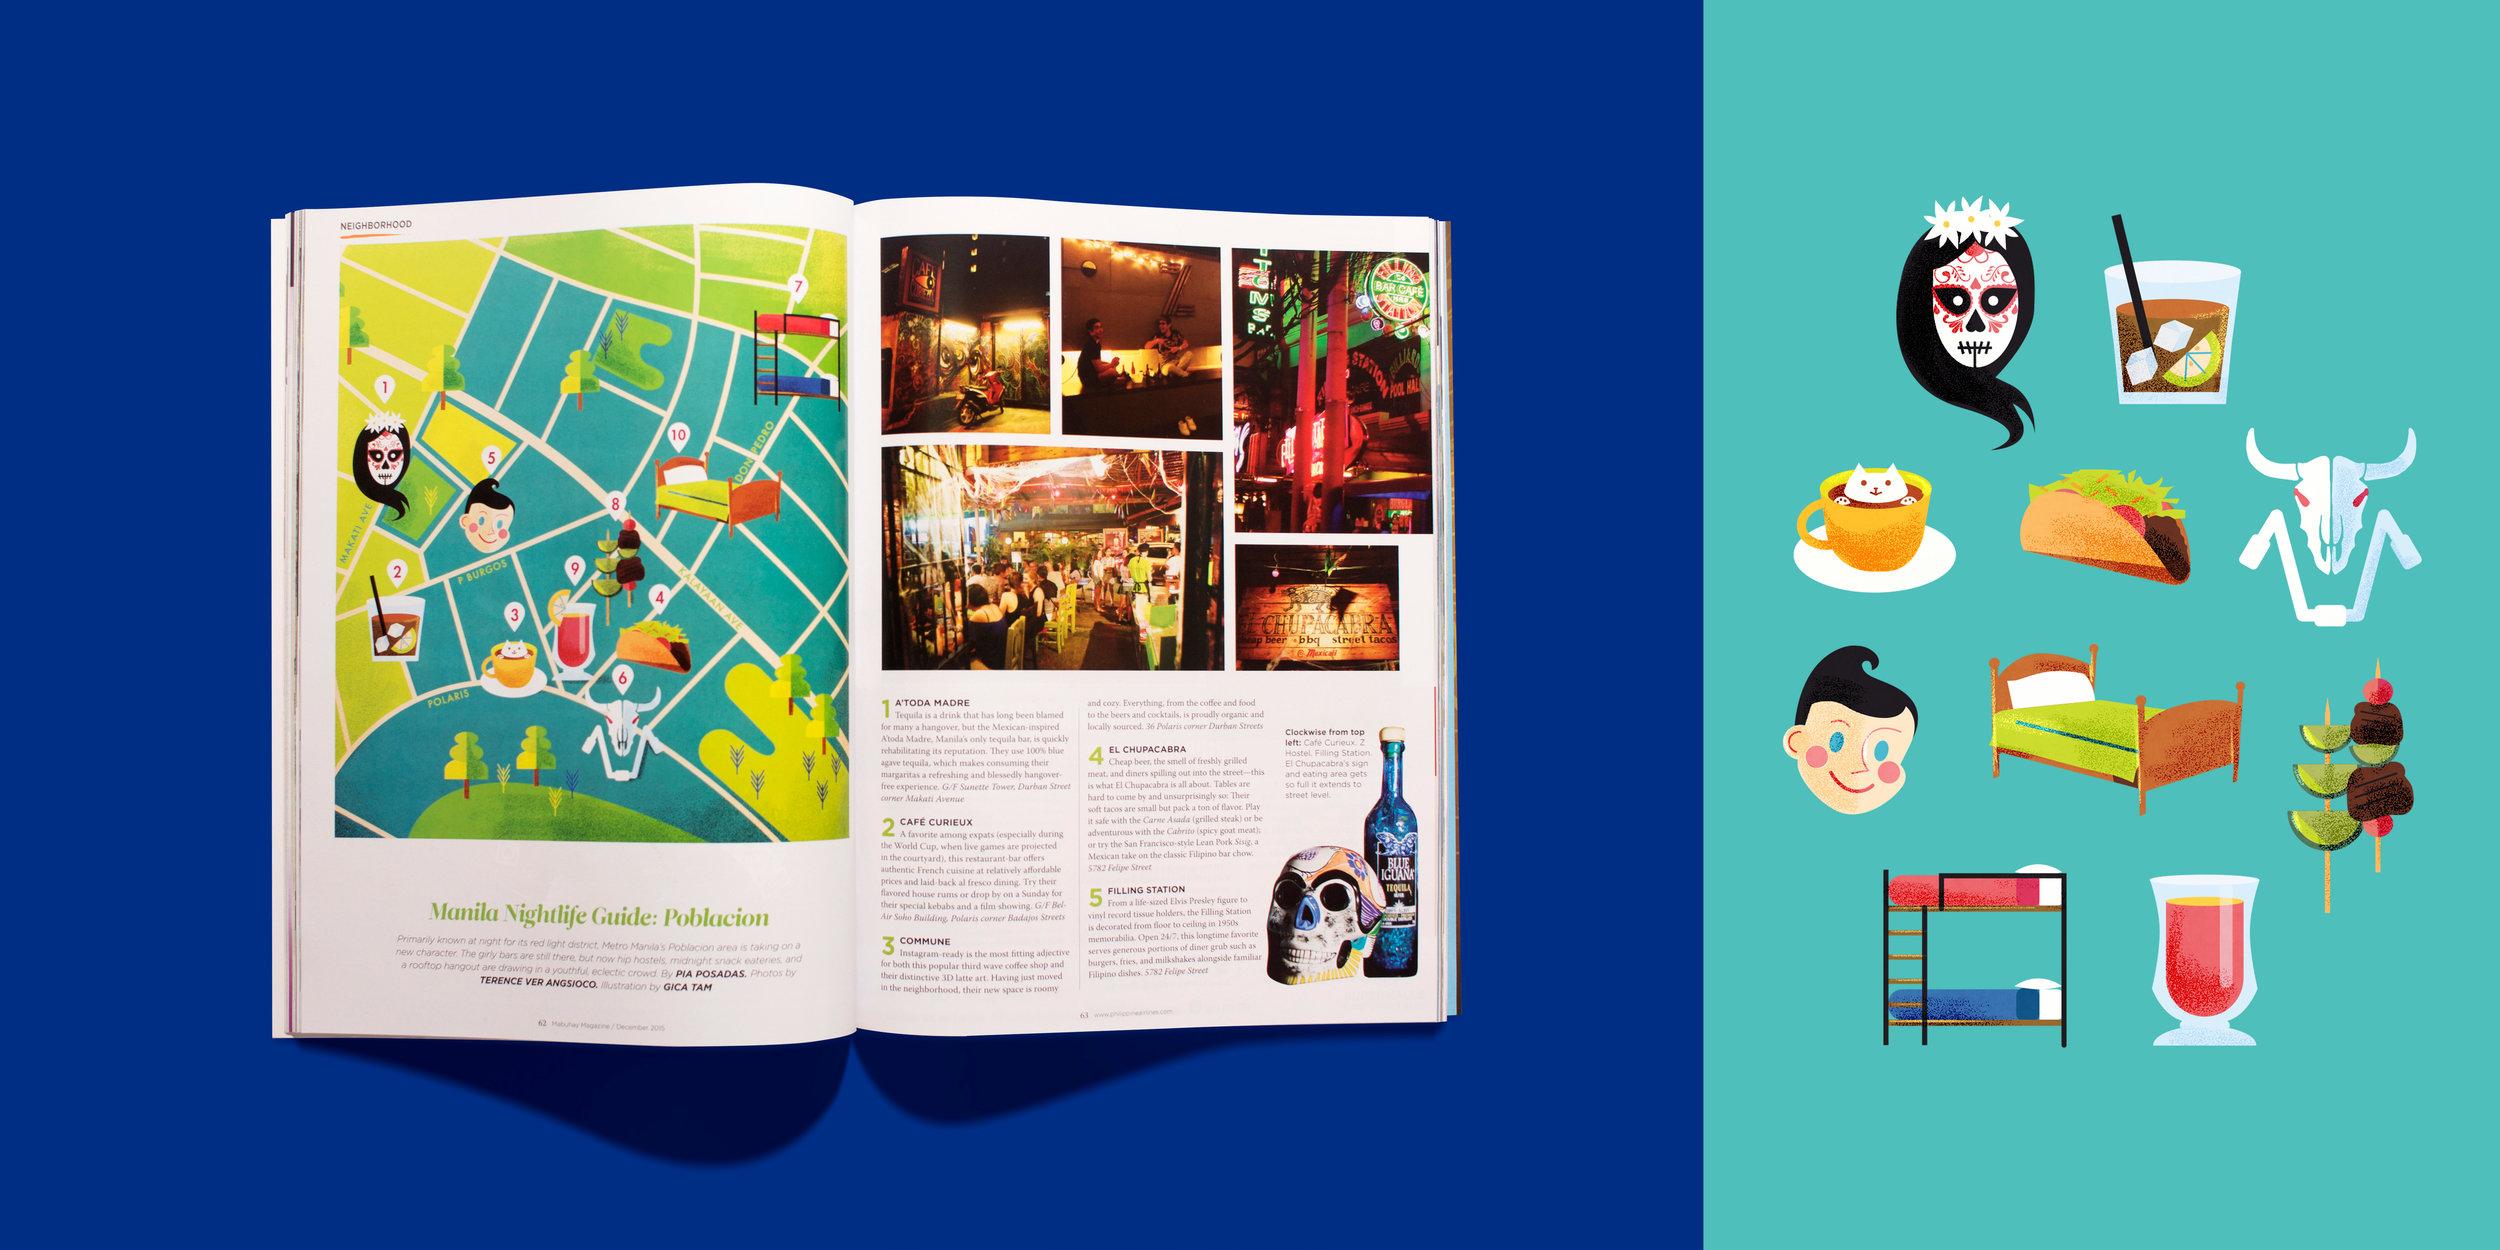 A'toda Madre, Junction Hostel, Commune, El Chupacabra, The Red Light, Café Curieux, Tambai, Handlebar, Filling Station, Z Hotel